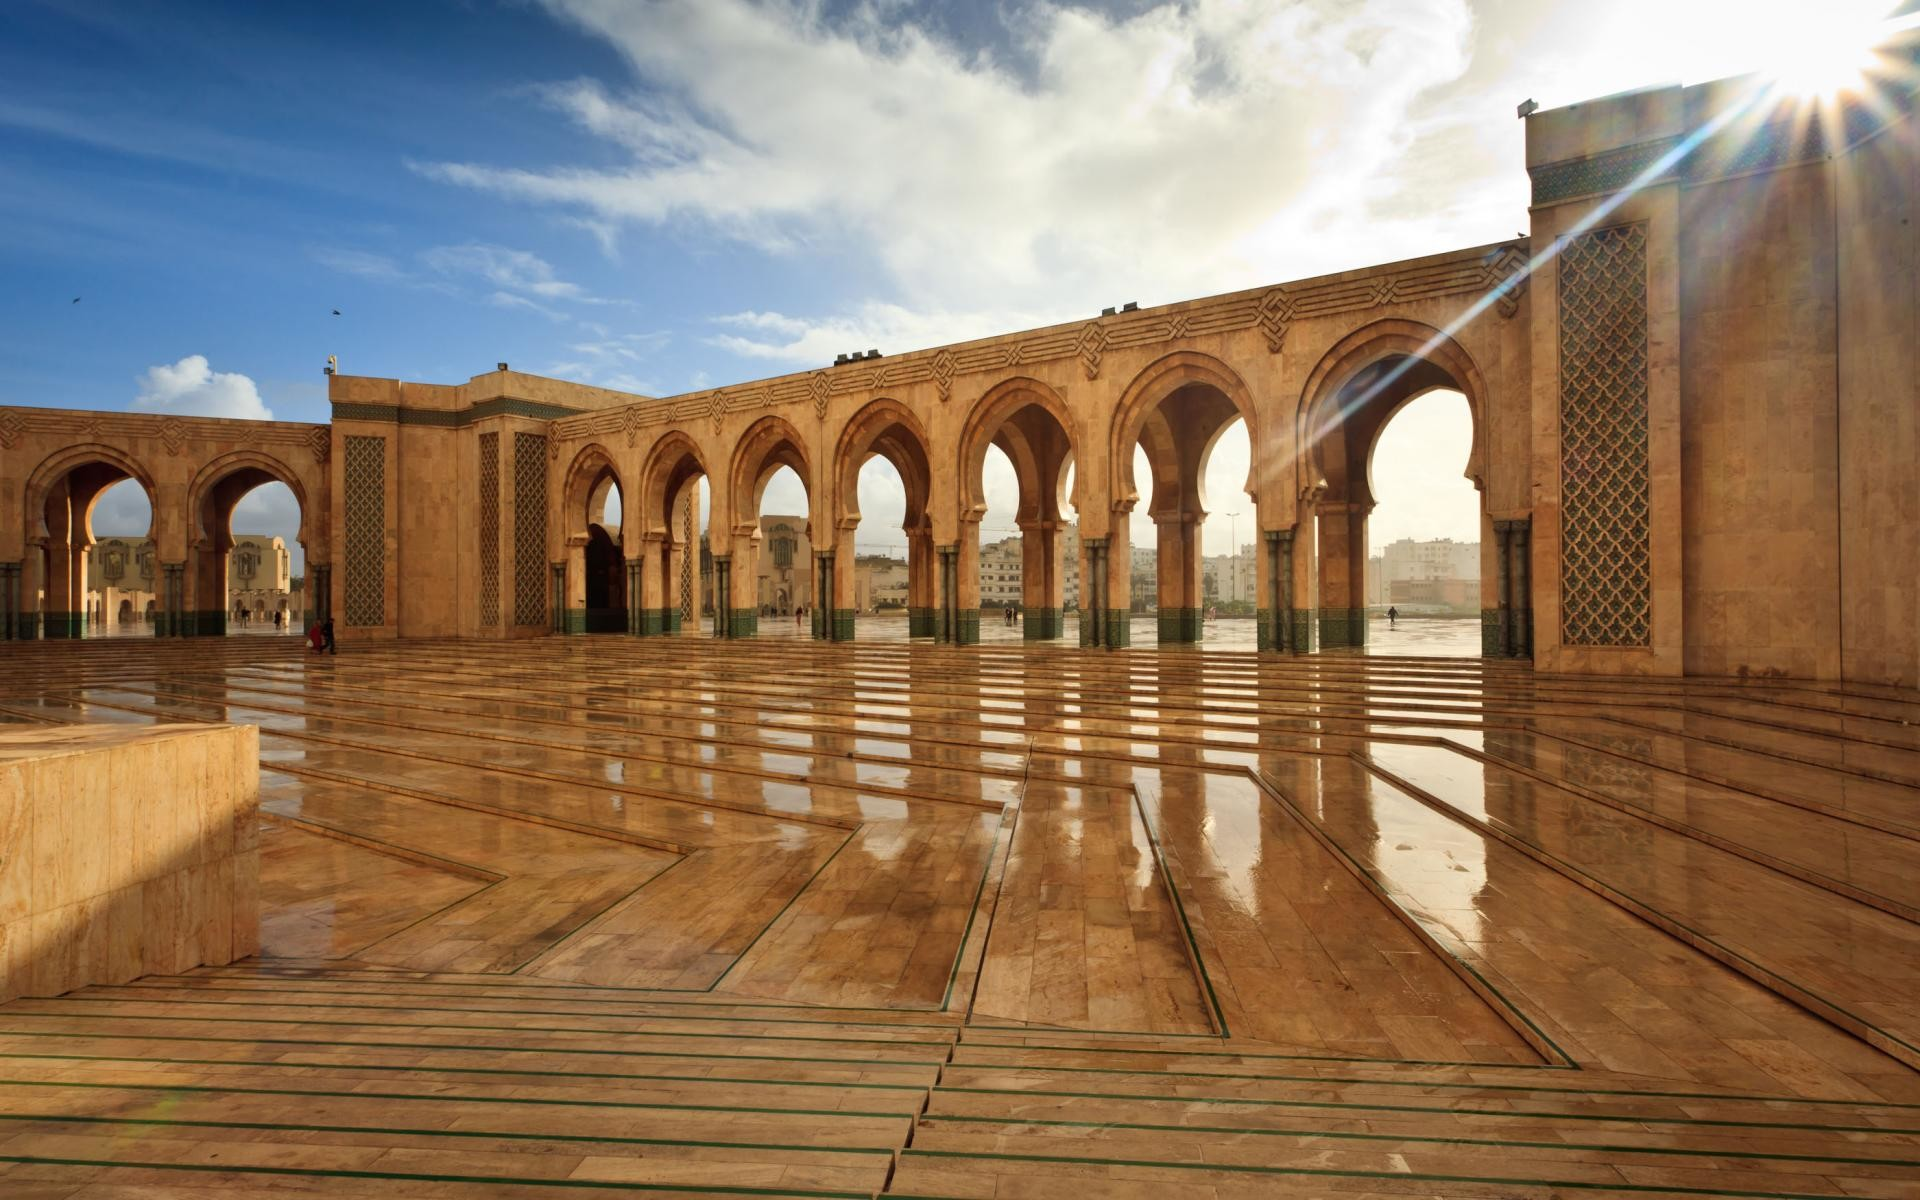 Res: 1920x1200, Morocco Wallpaper